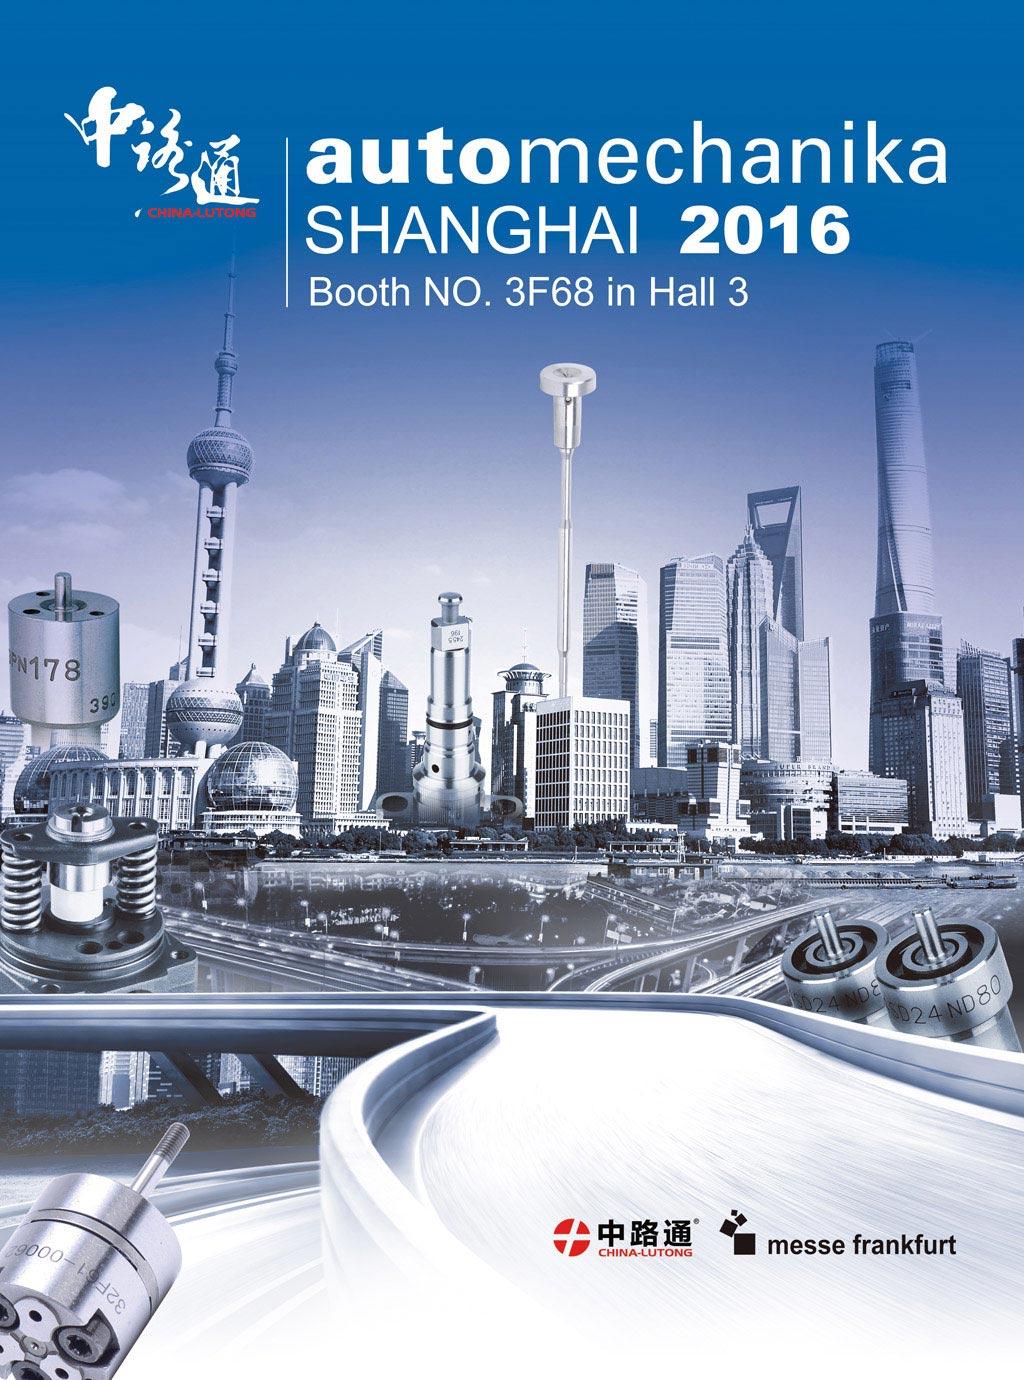 Automechanika Shanghai 2016 Booth NO.: 3F68 in Hall 3 30.11--3.12.2016